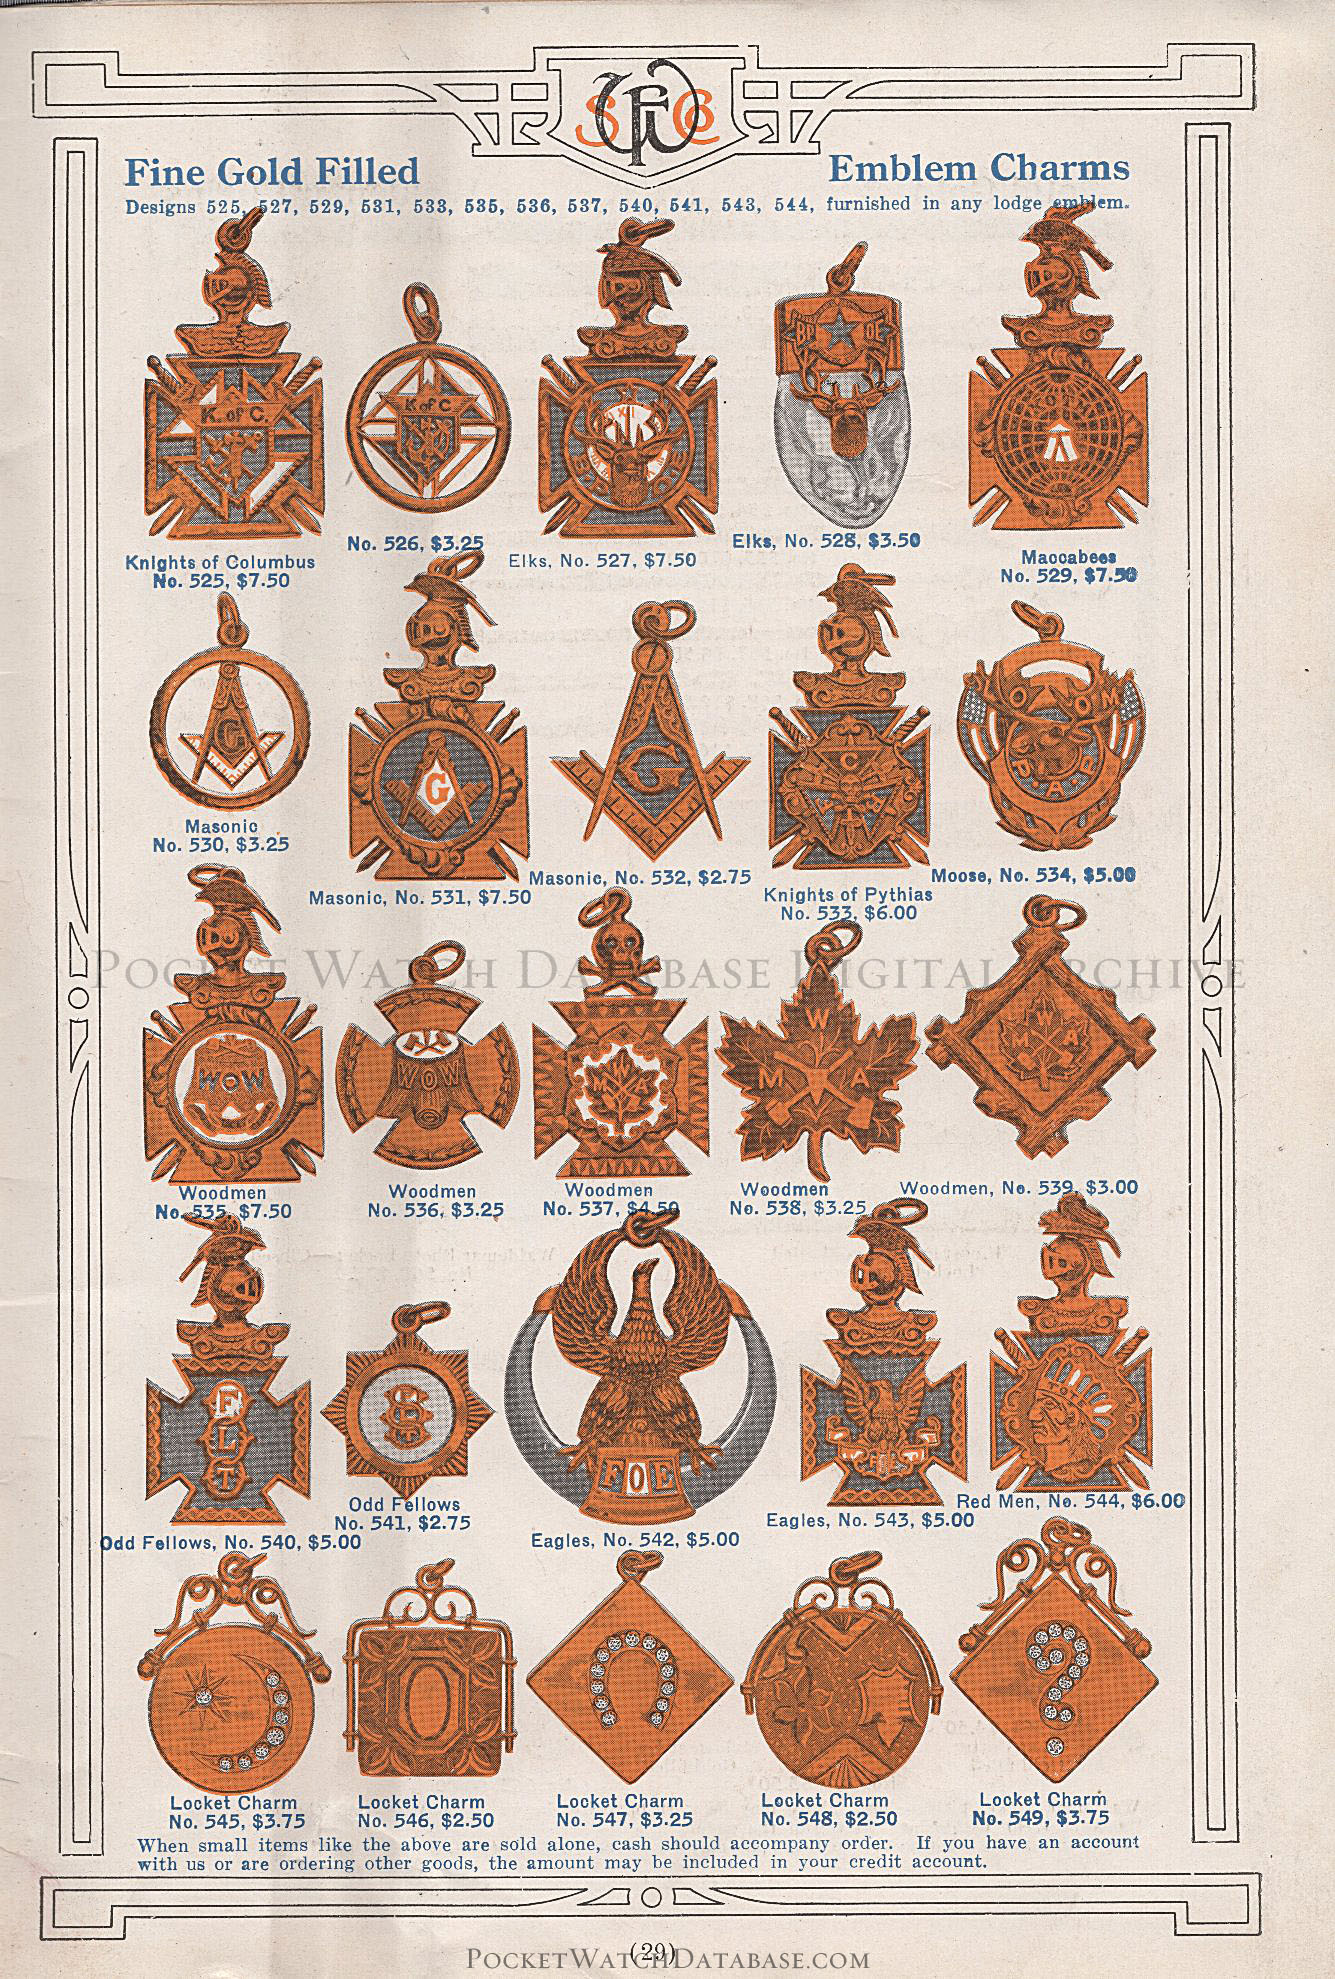 Solid Gold Waldemar Chains - Santa Fe Watch Co  Catalog (c 1920